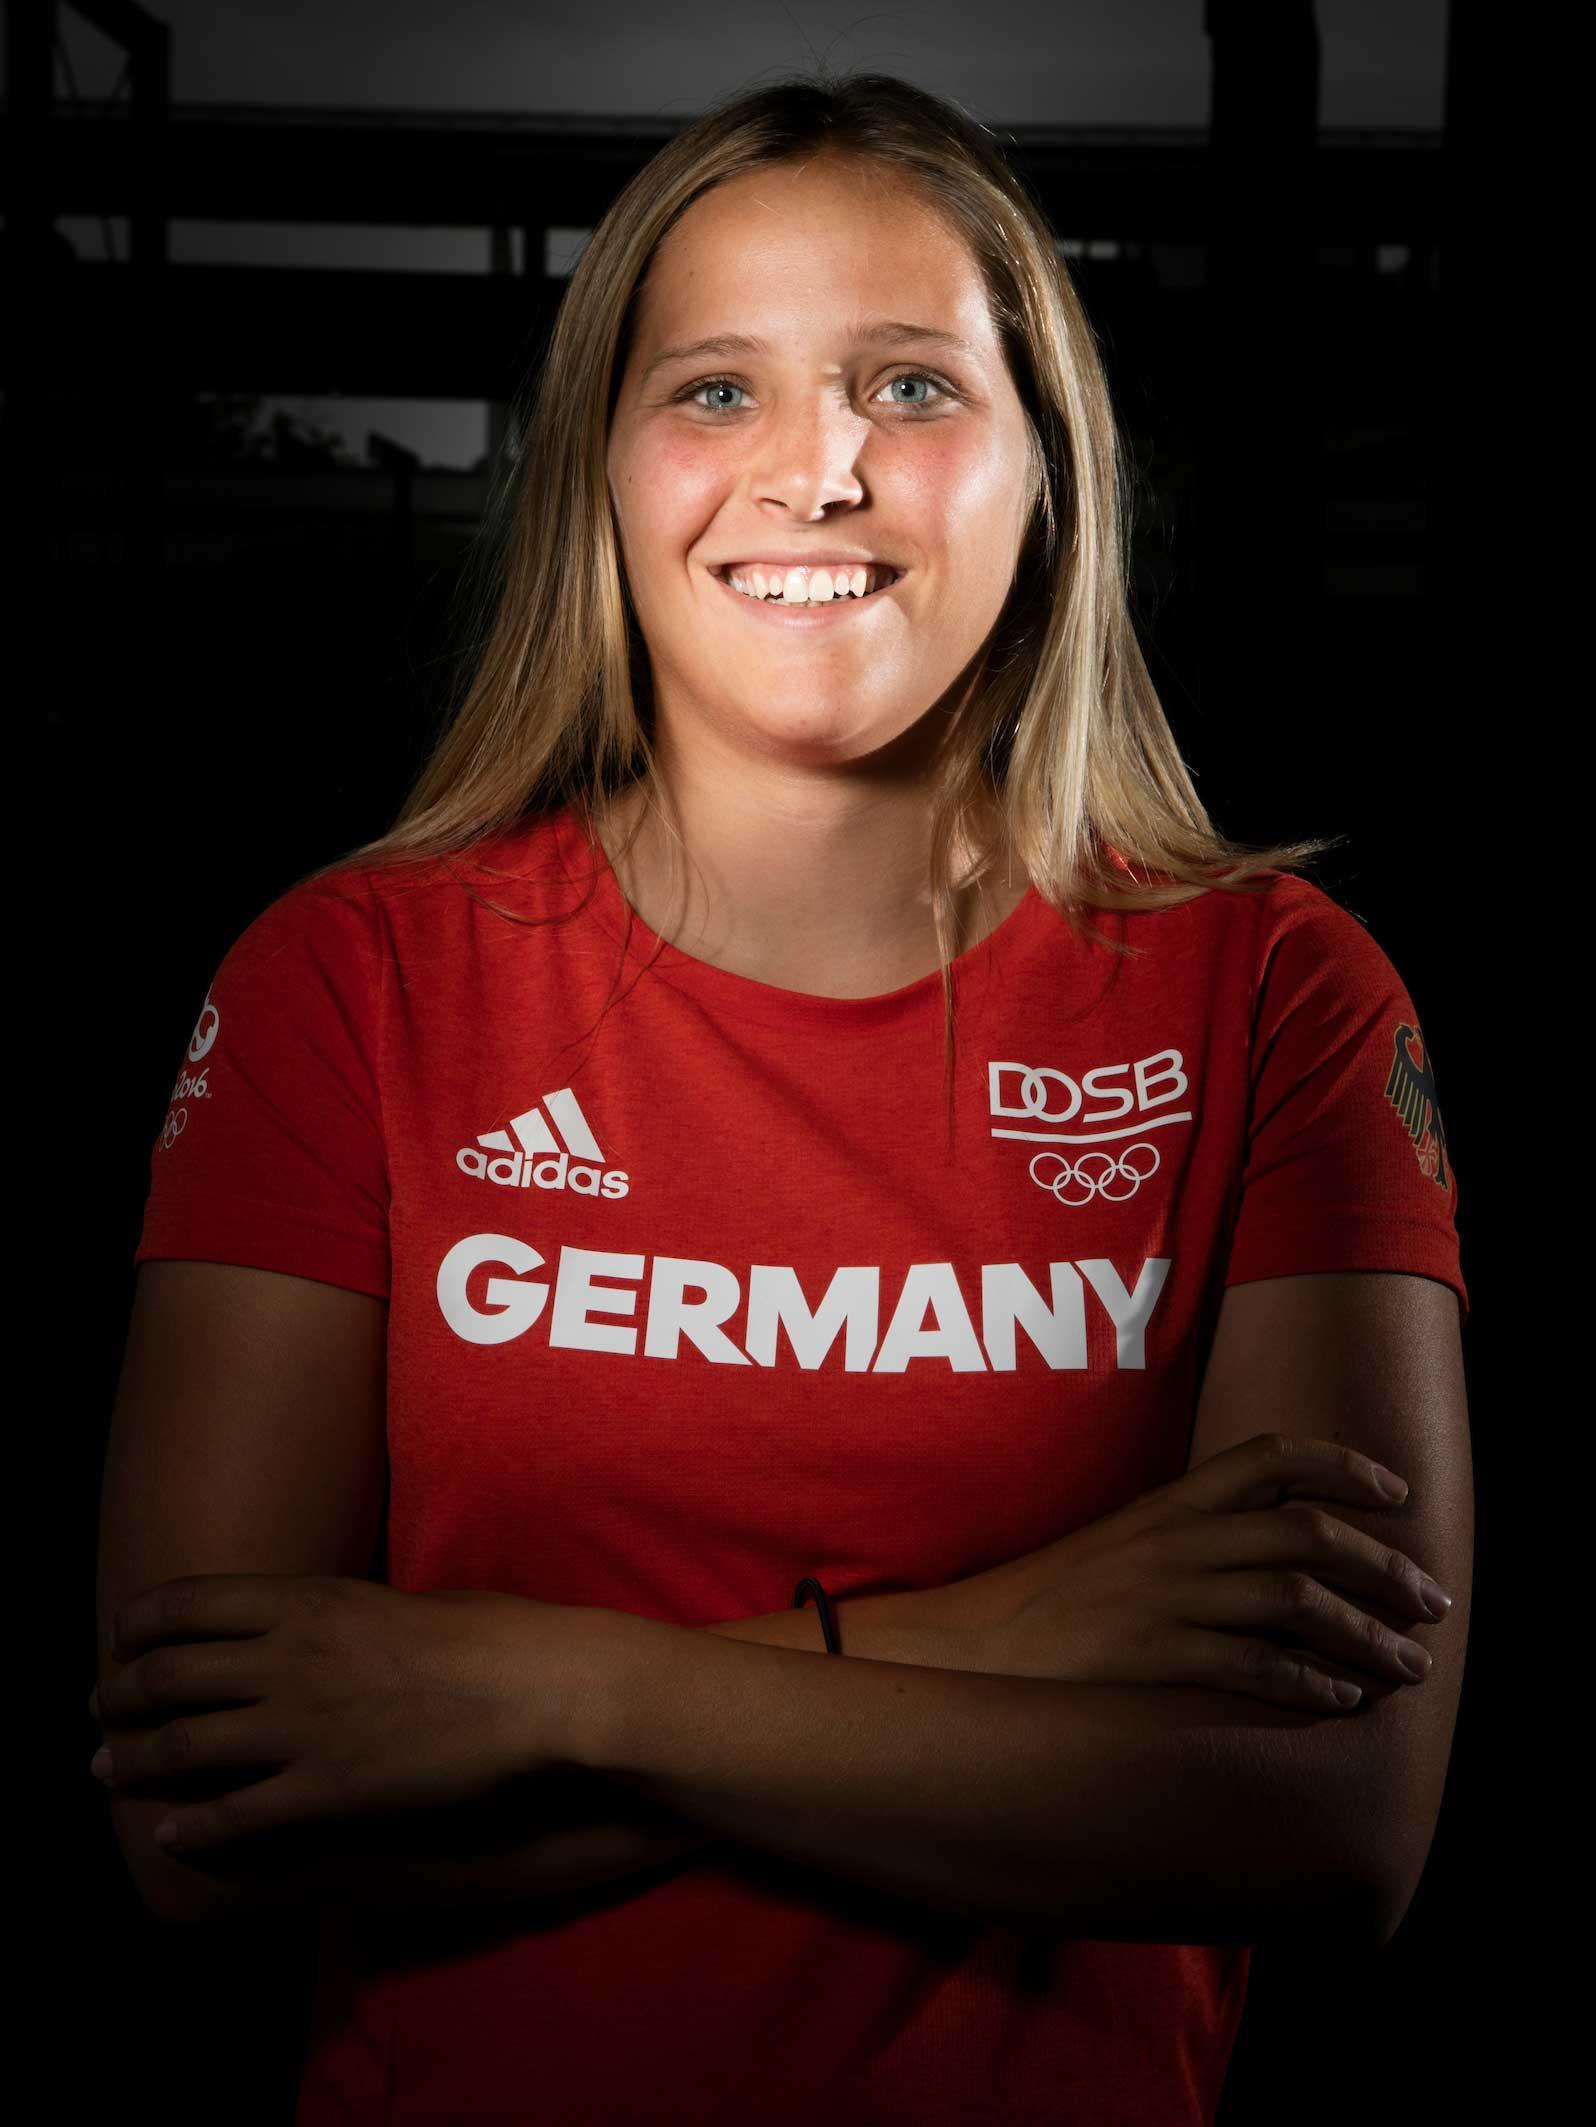 Carolina Werner